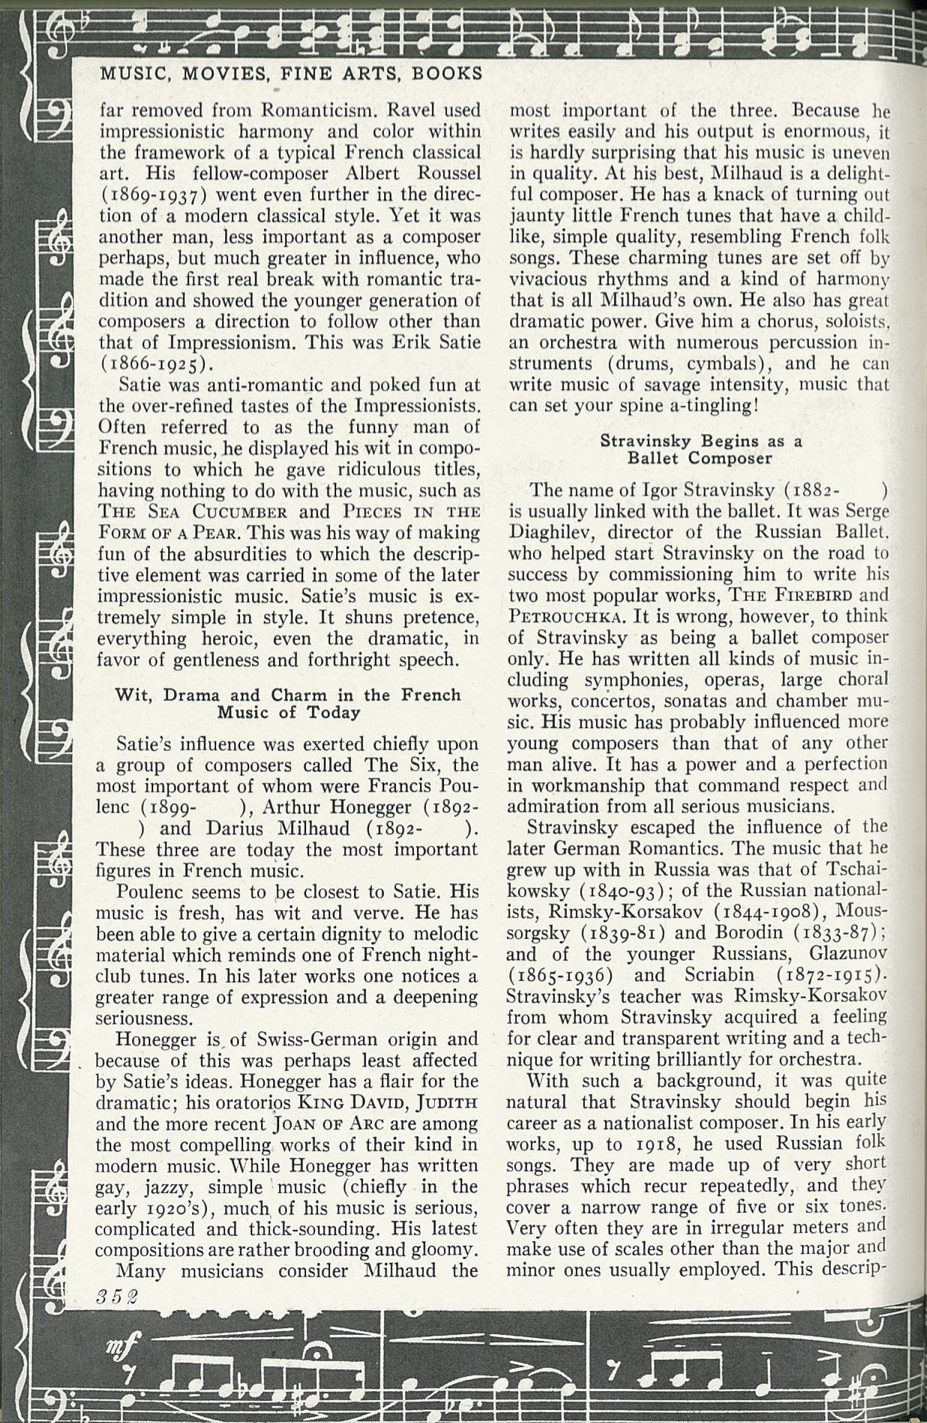 Fine Page 352